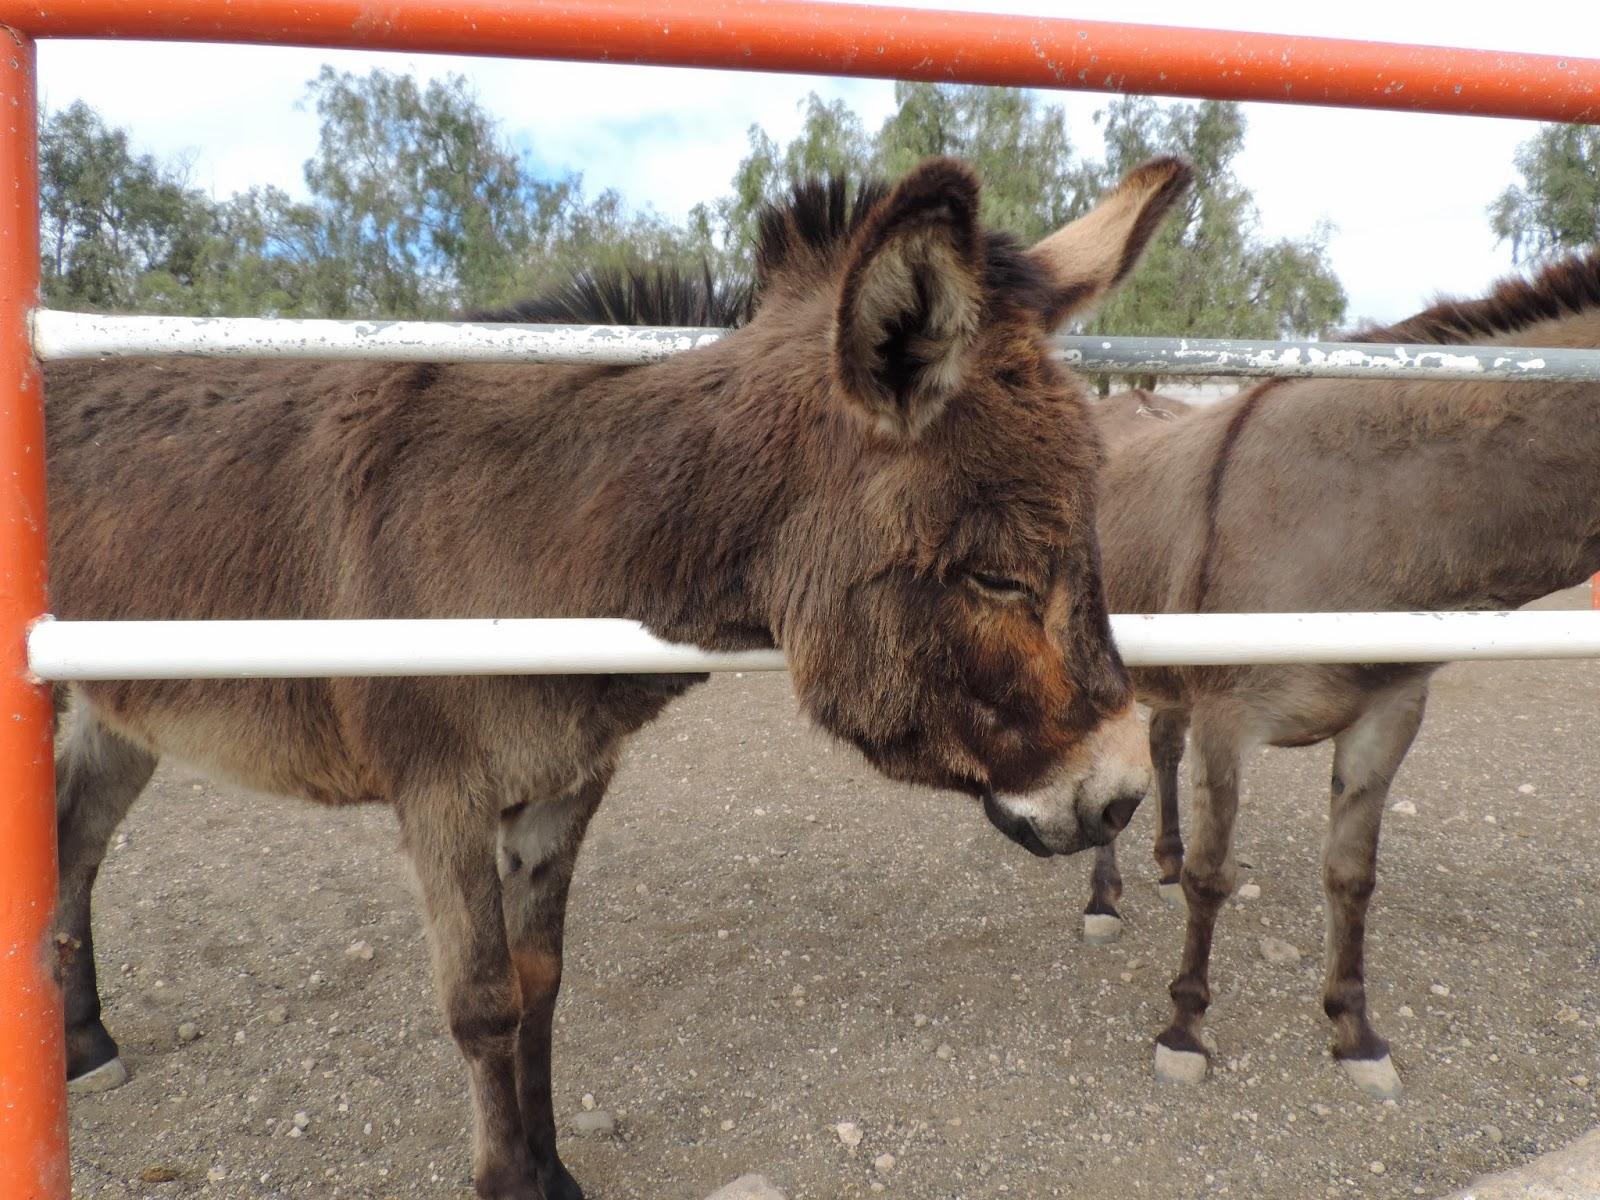 Donkey's torn photo